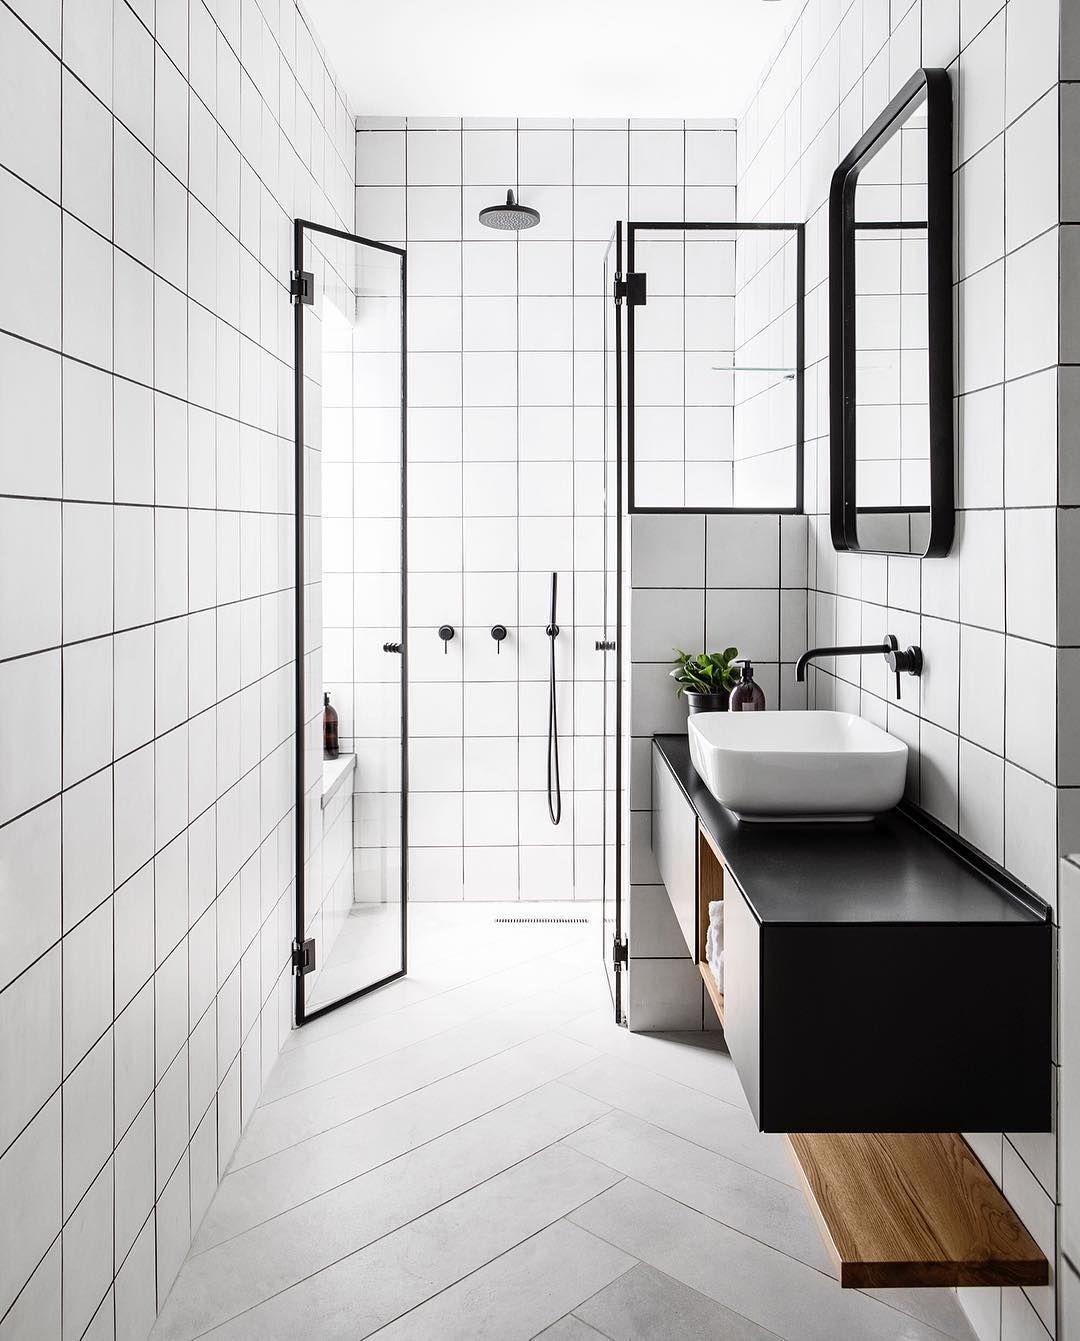 Badezimmer design dusche  followers  following  posts  see instagram photos and